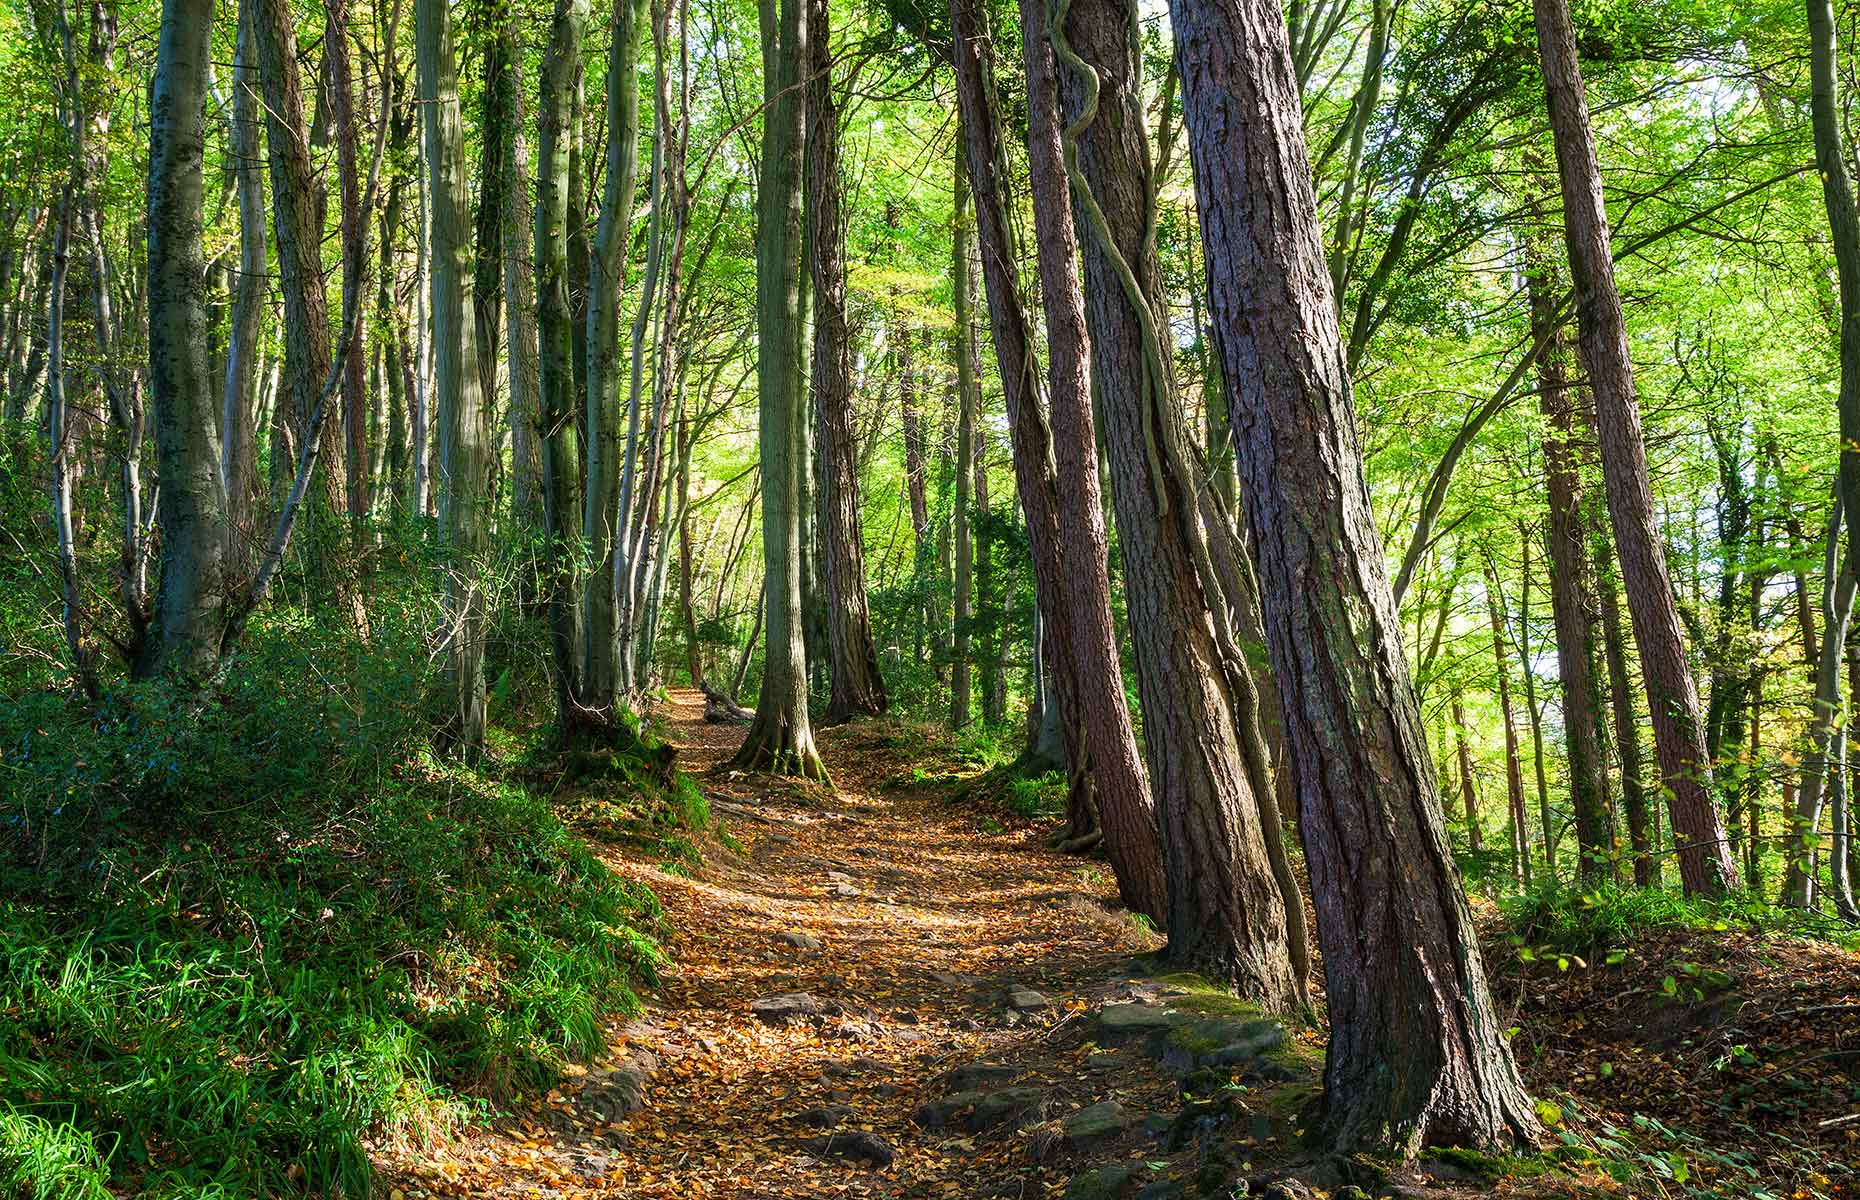 Wye Valley (Image: Billy Stock/Shutterstock)